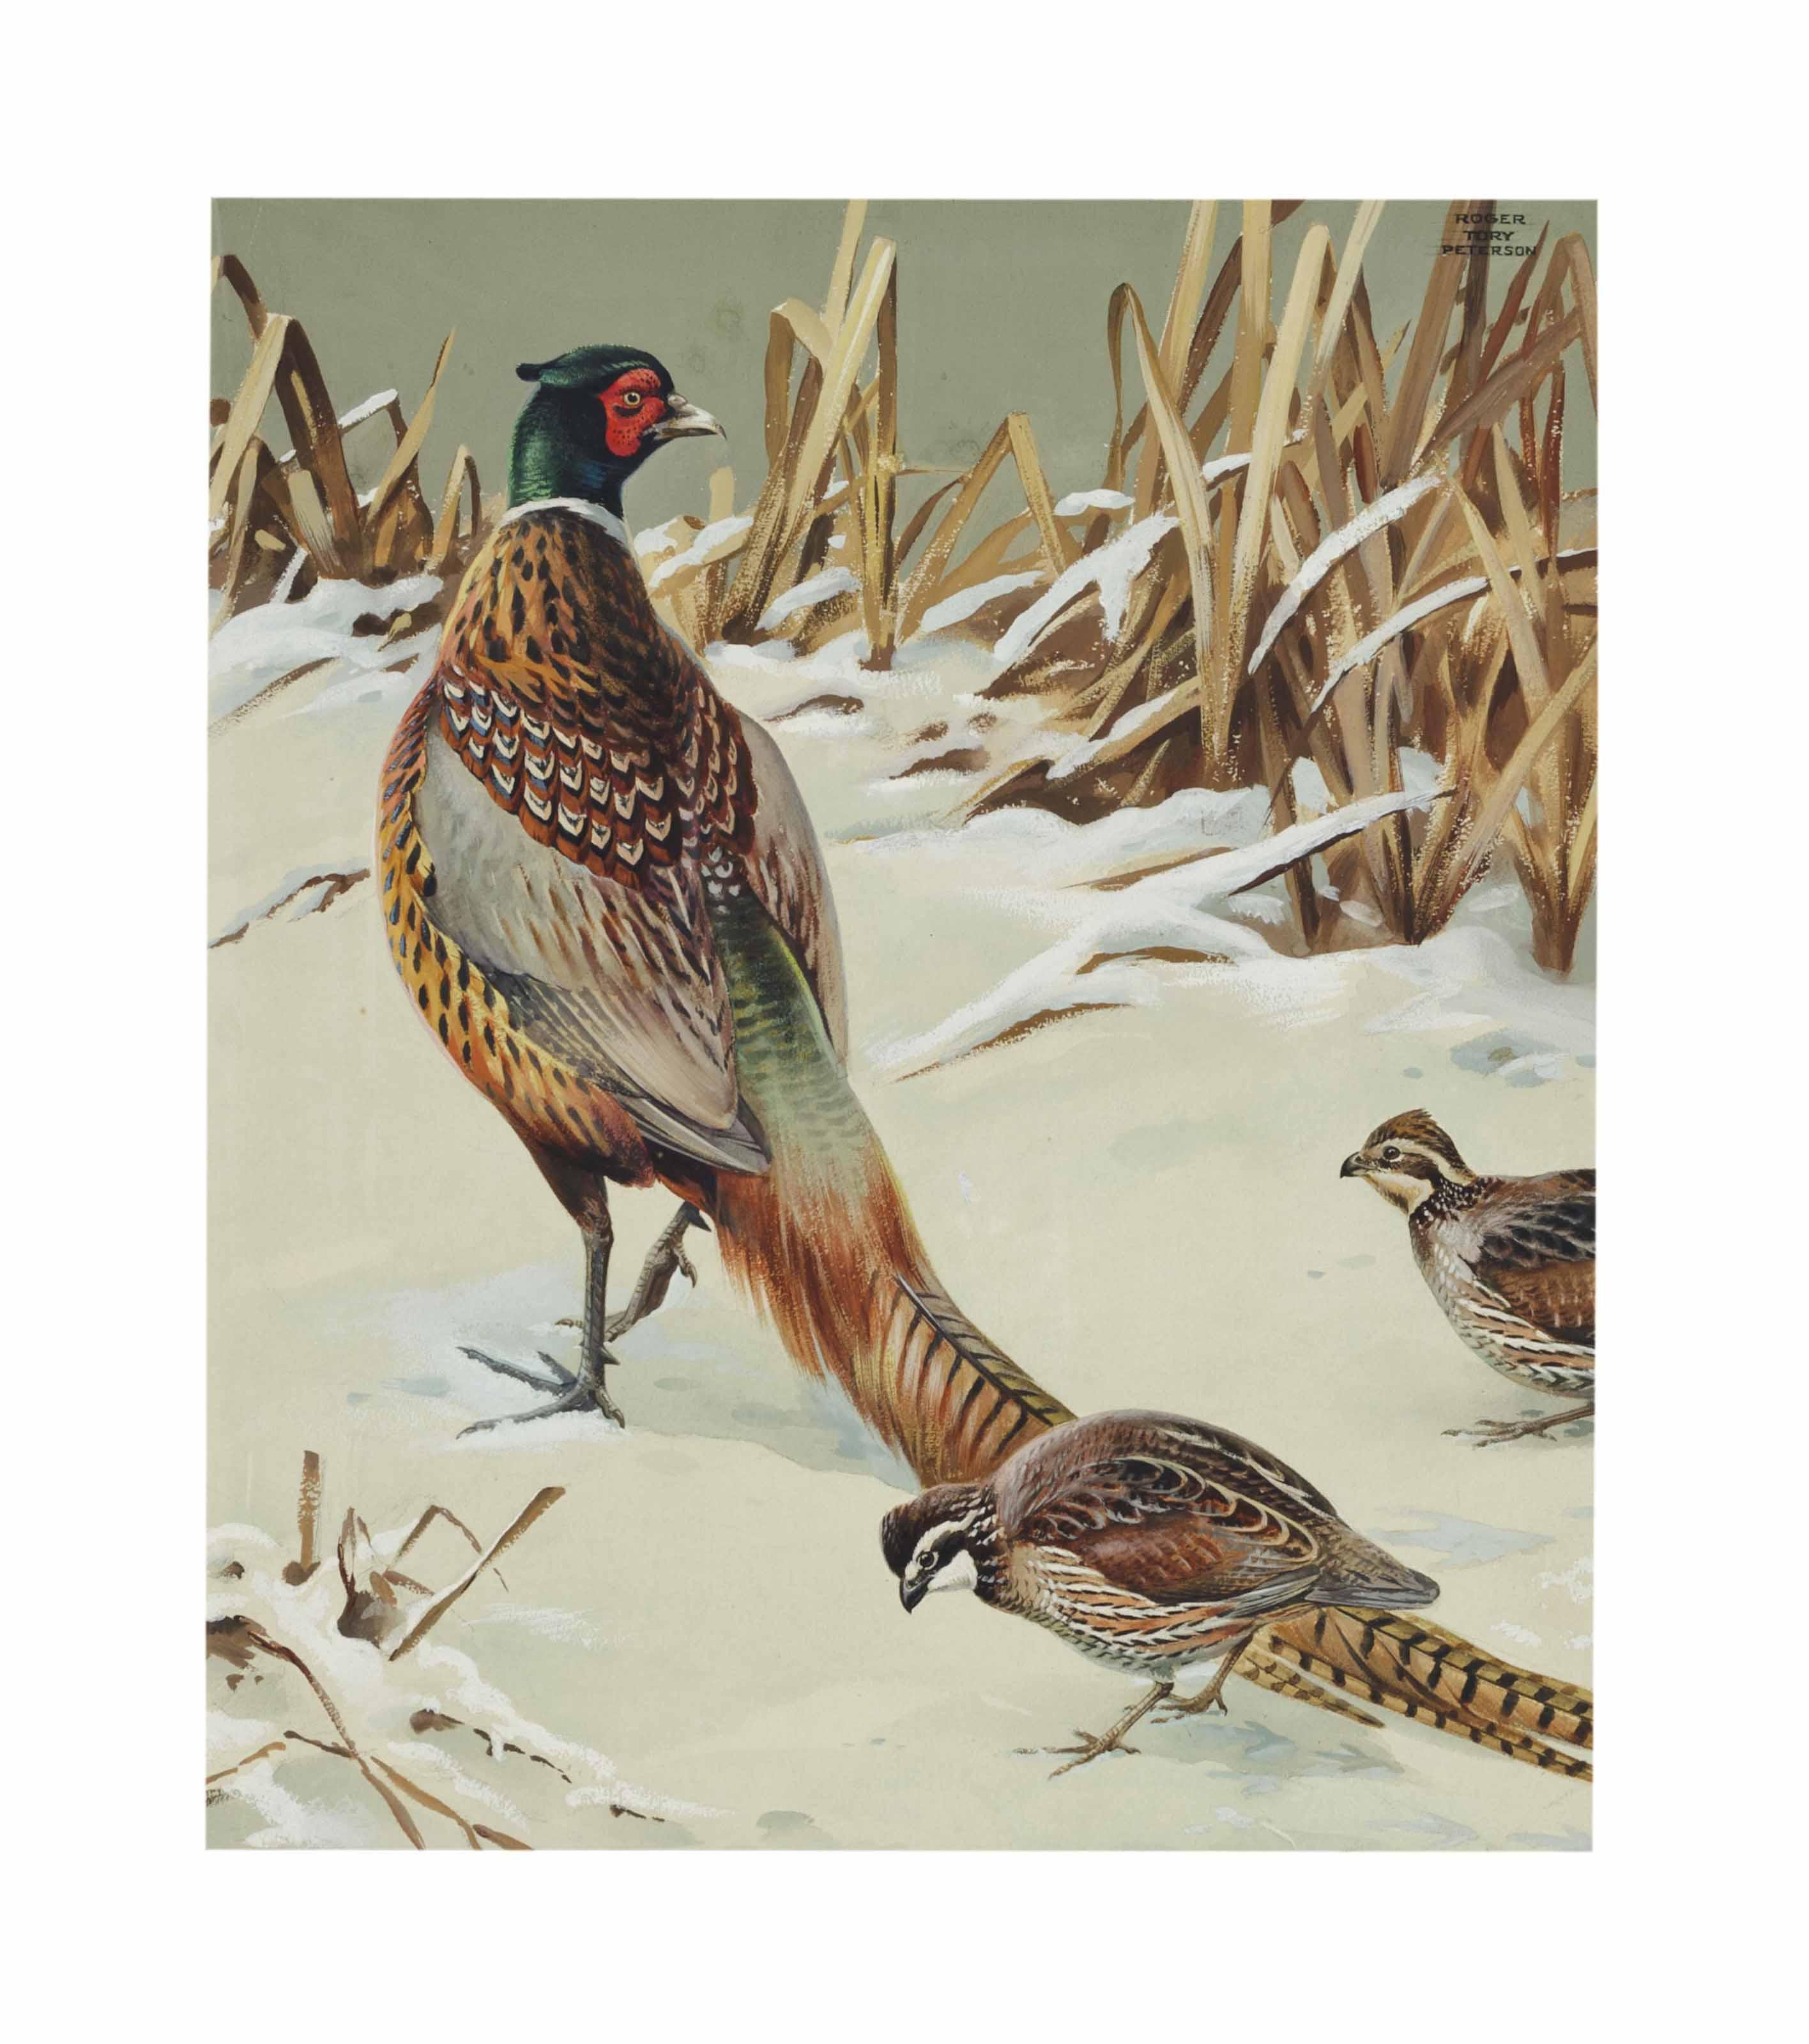 Pheasant and Quail